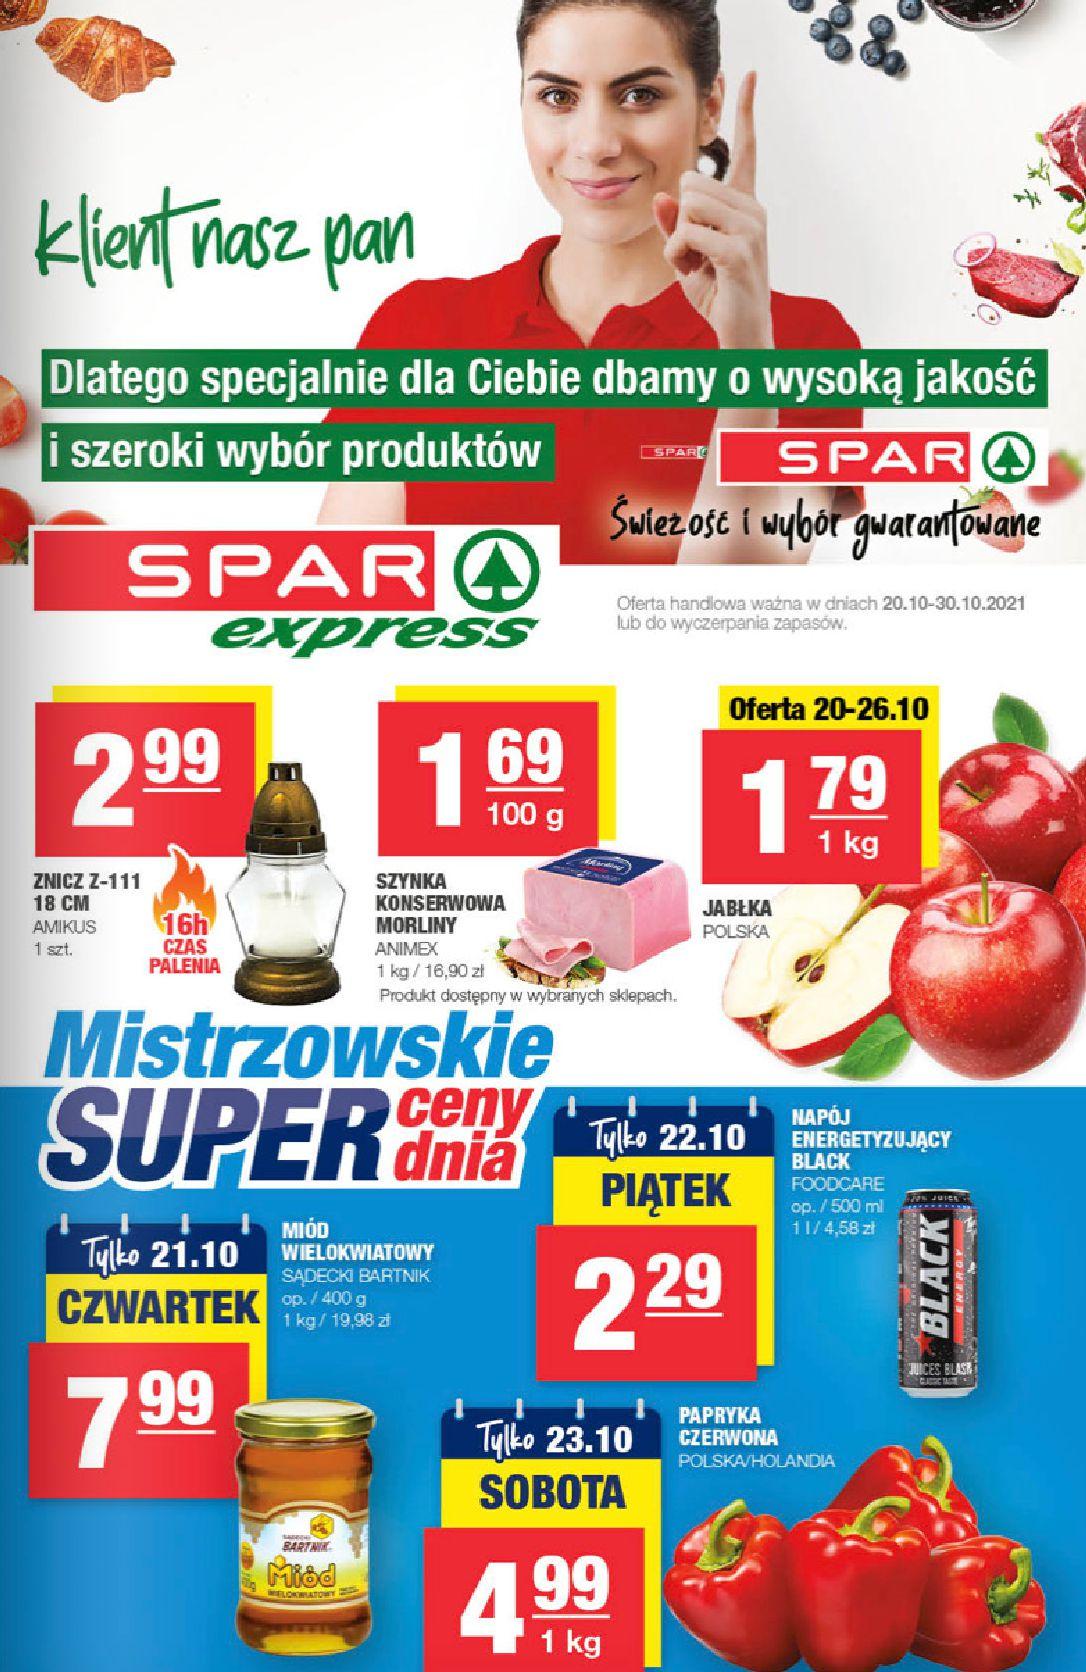 Spar:  Gazetka SPARexpress 19.10.2021